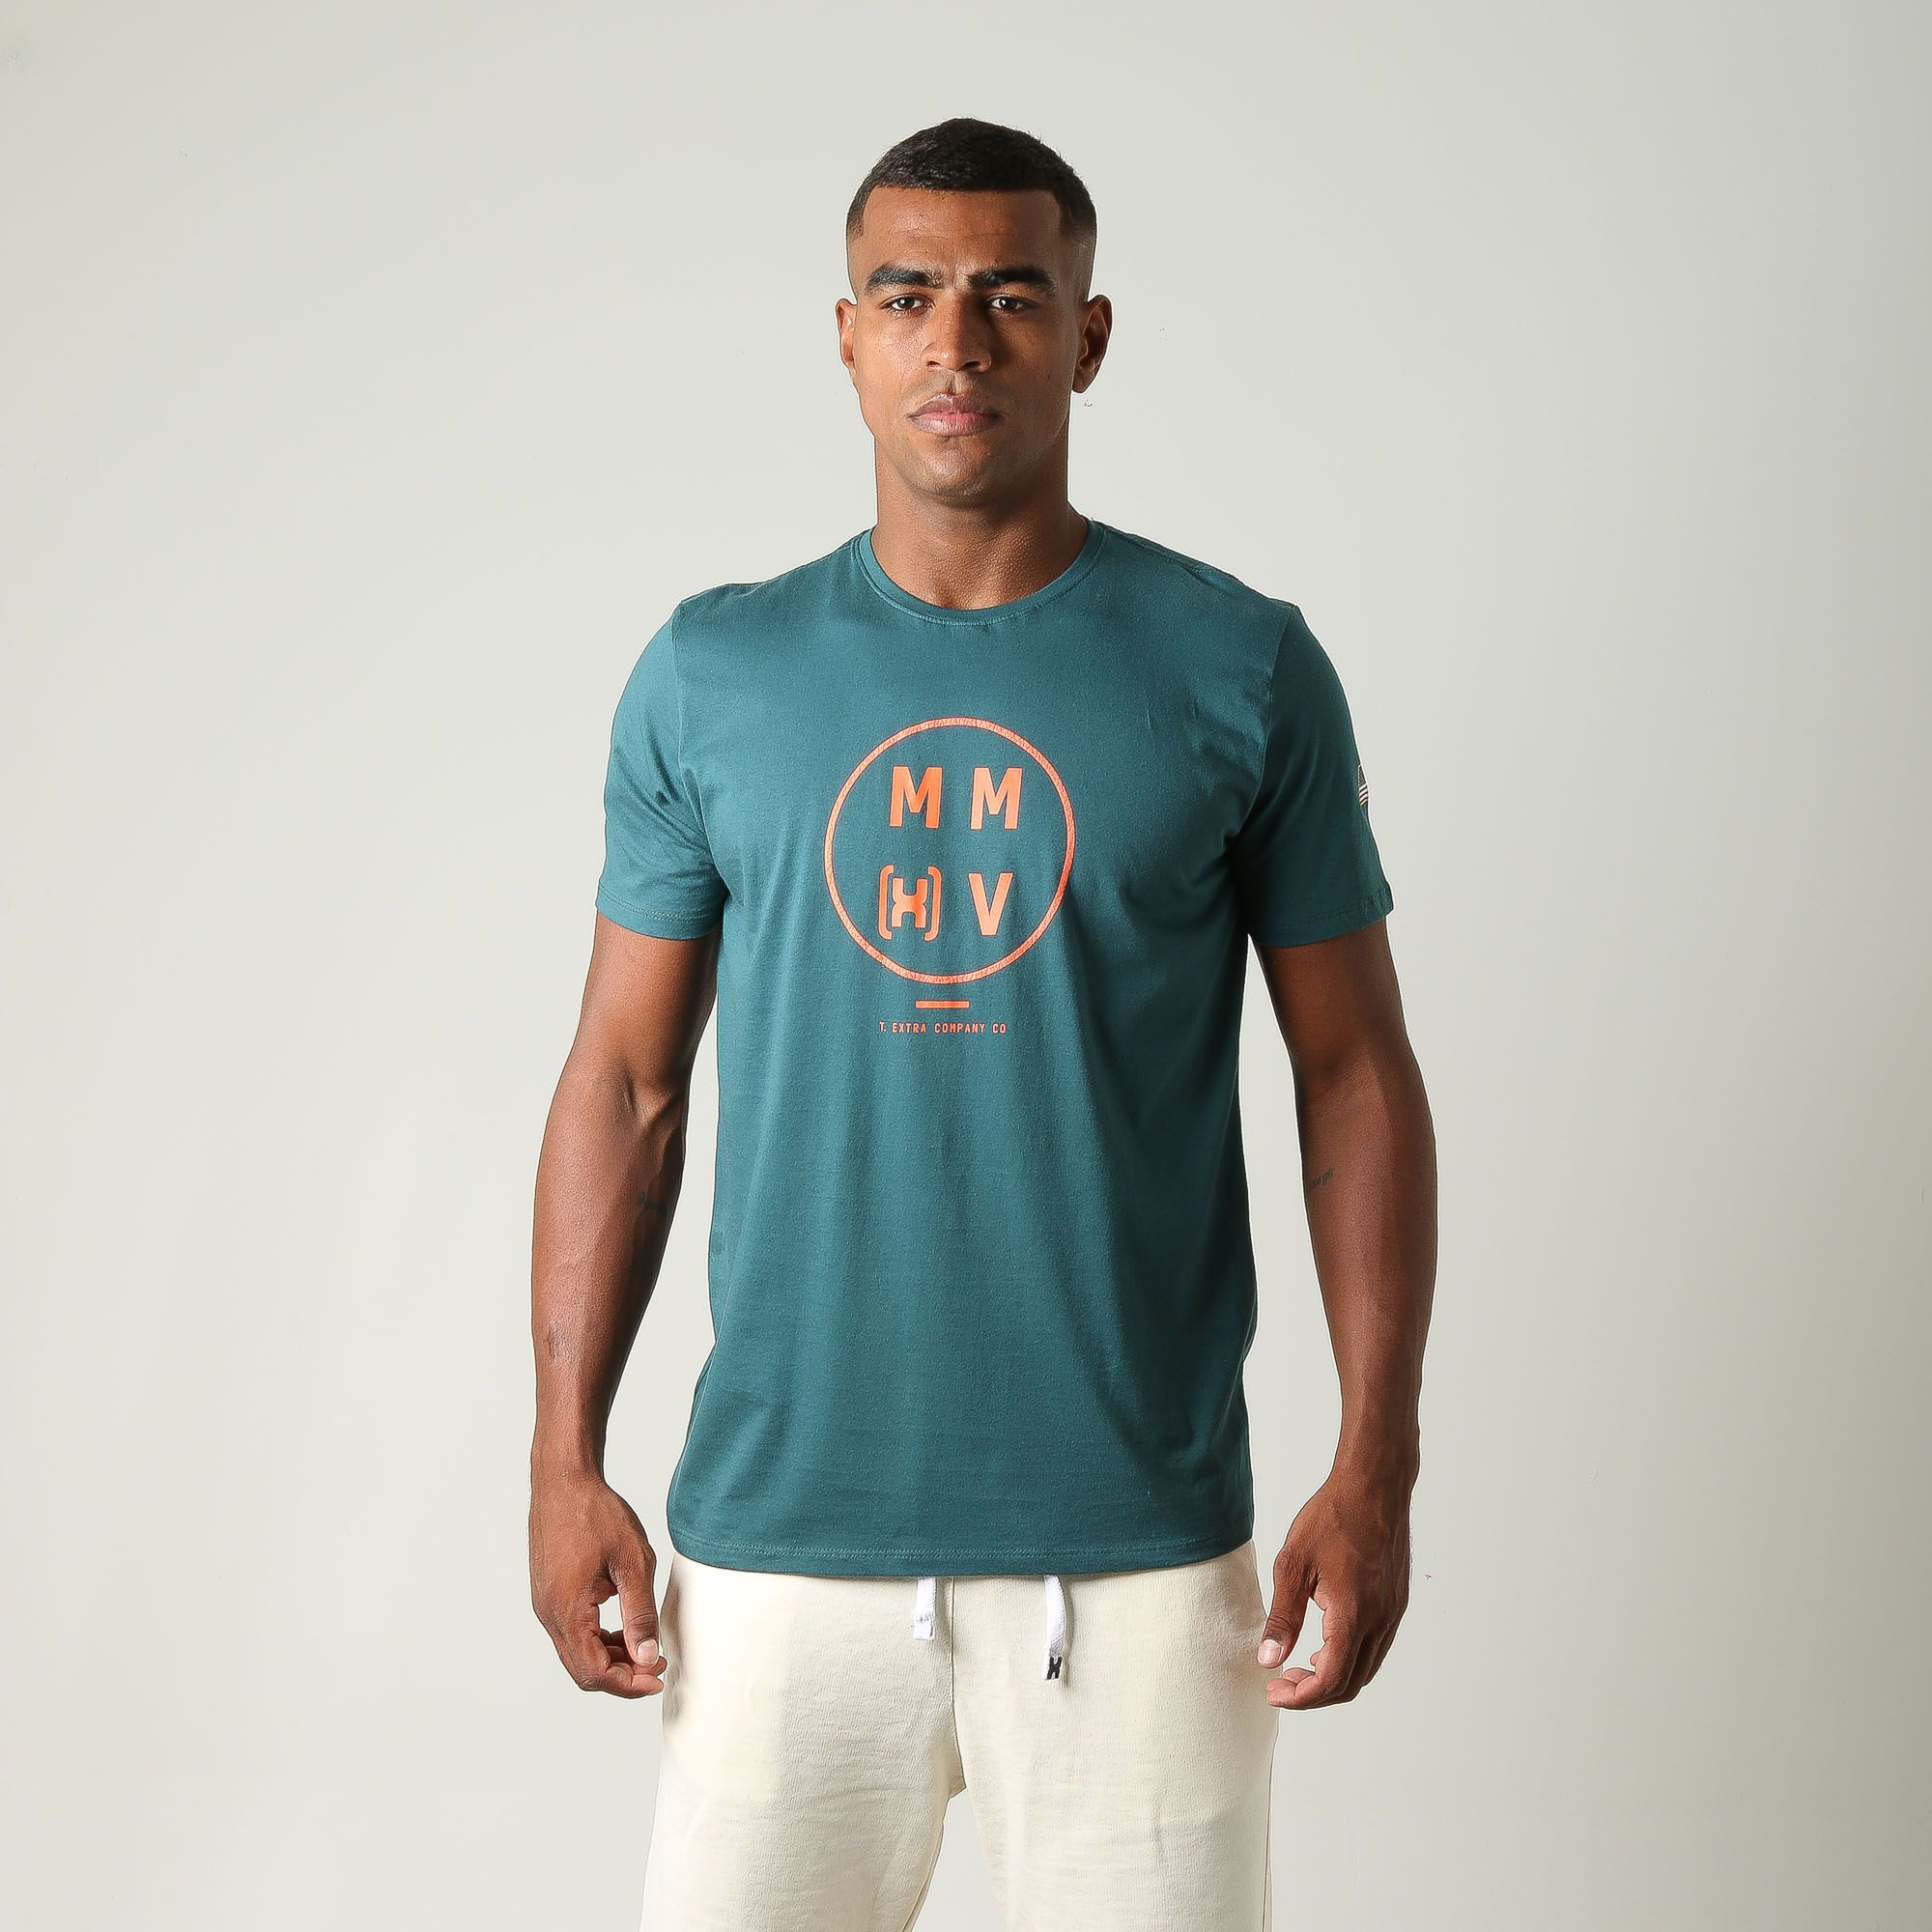 Camiseta Masculina TXC 1705